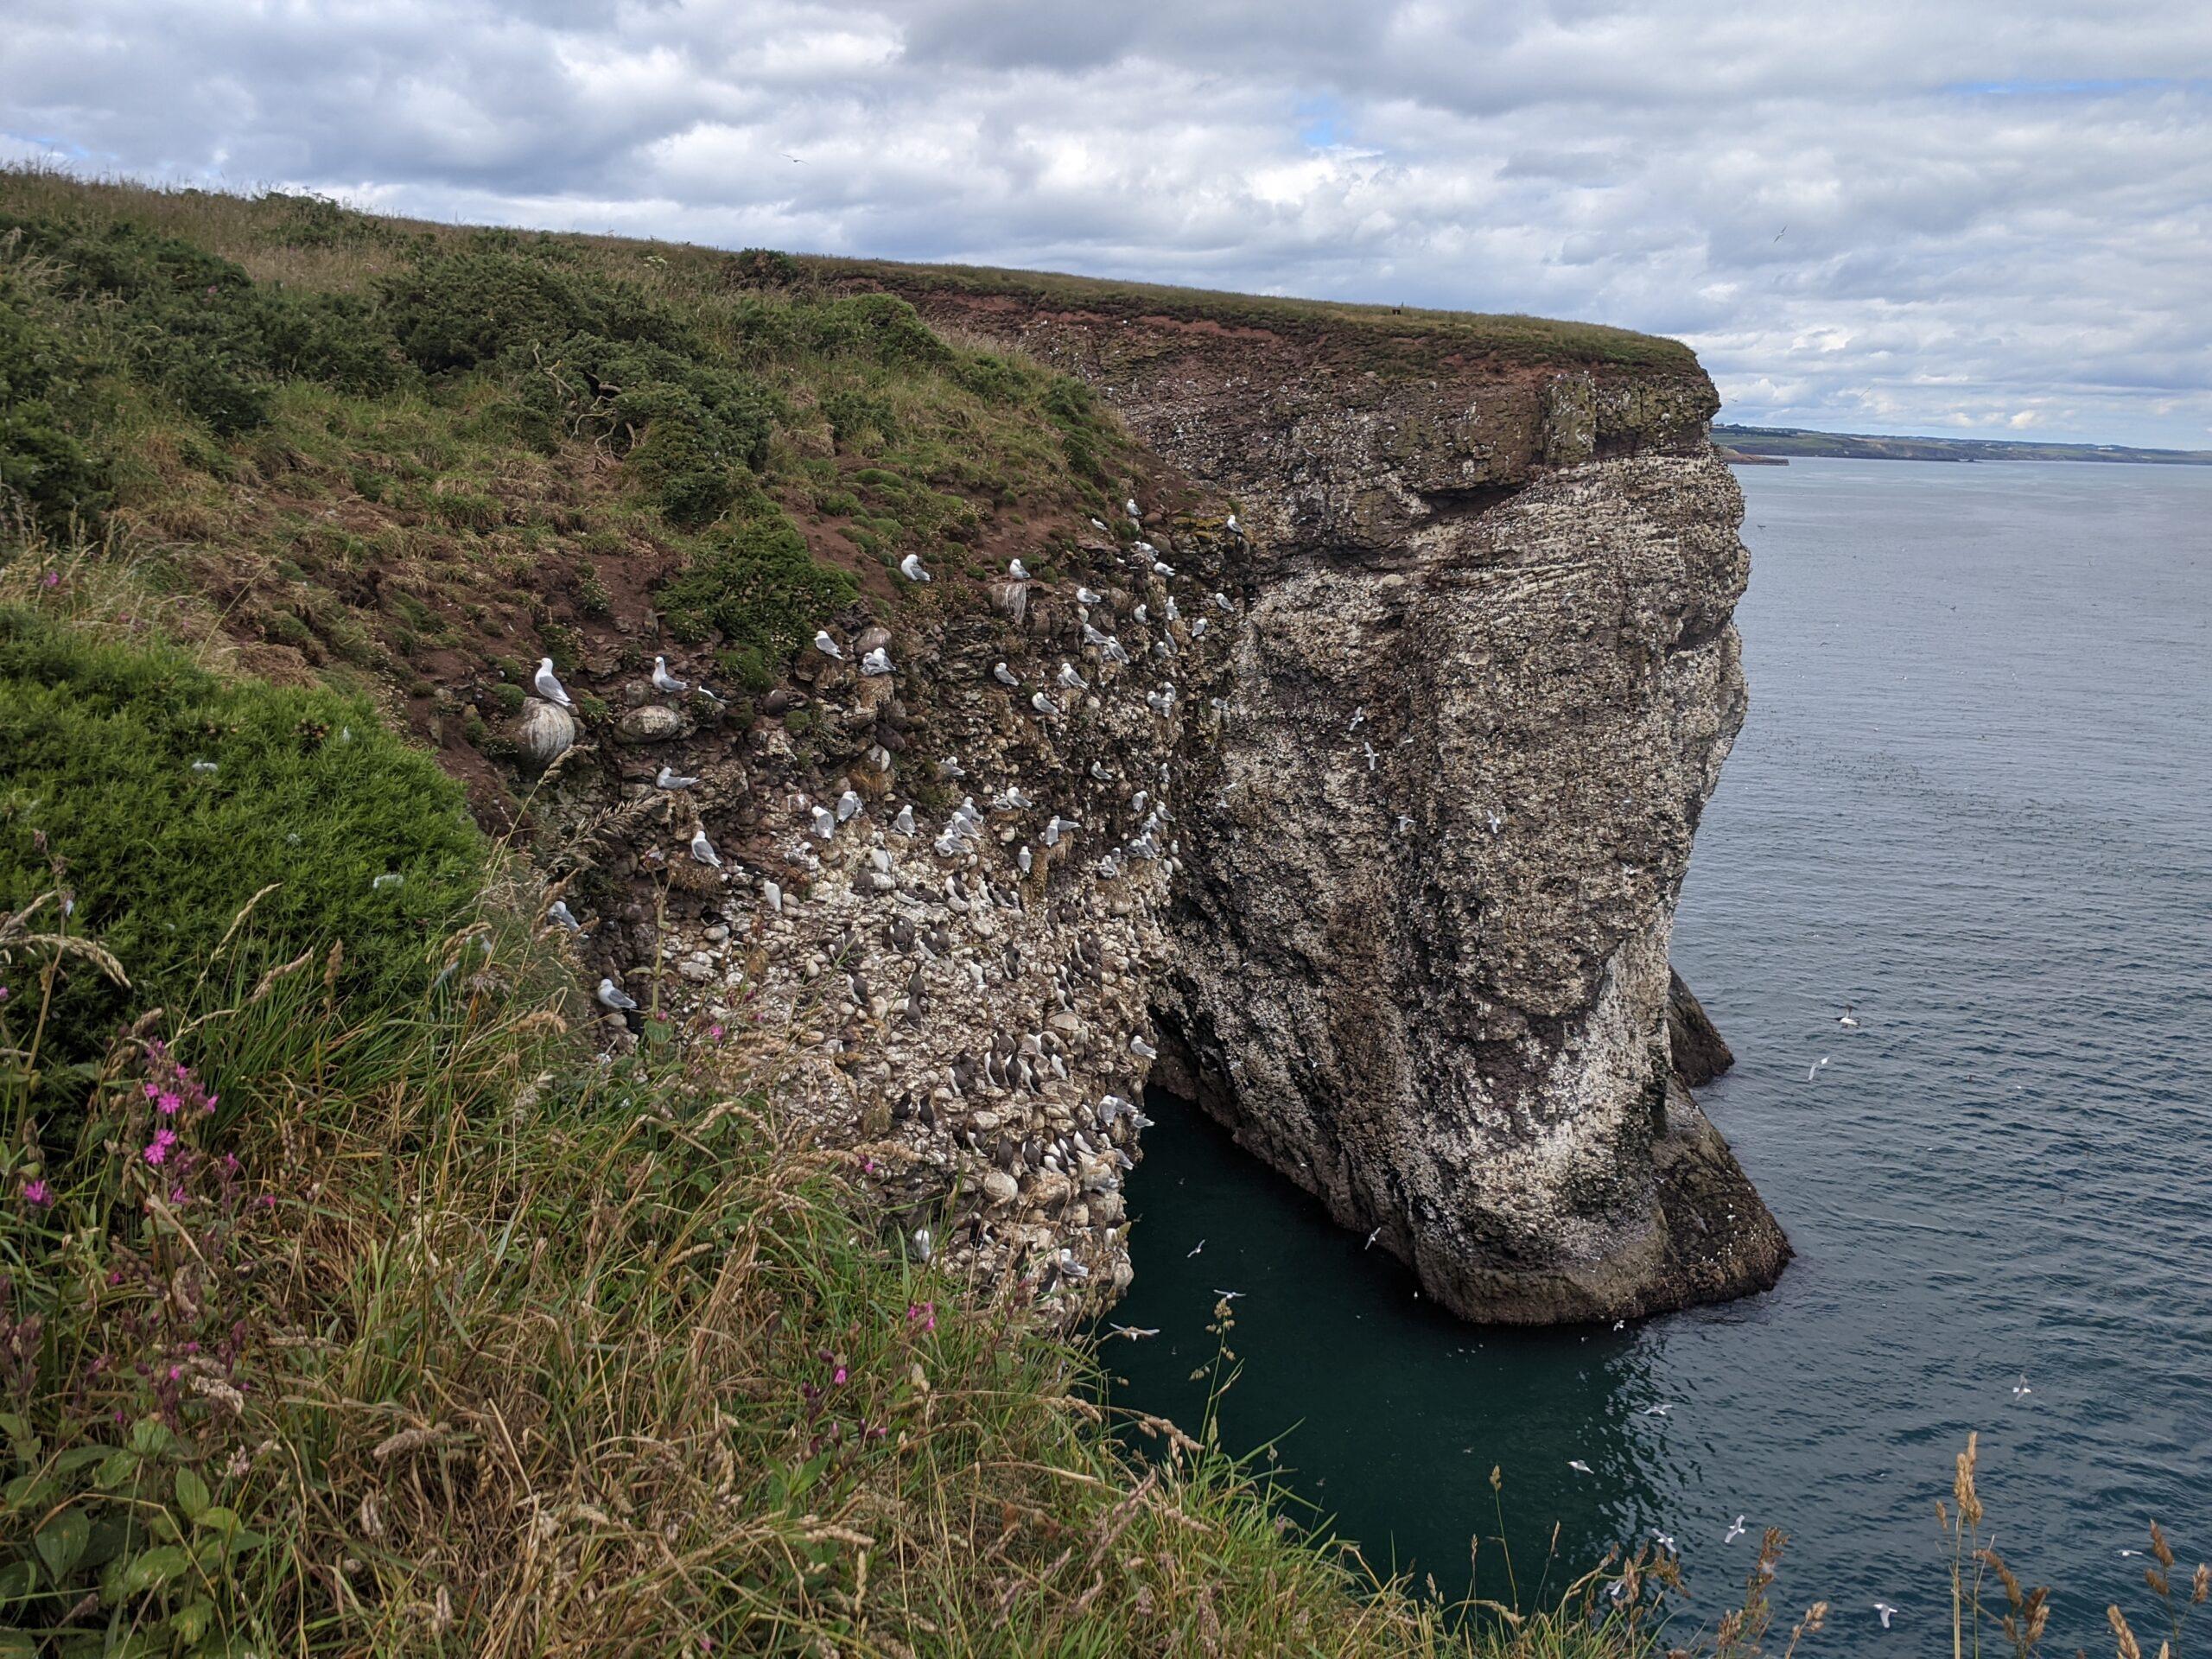 Cliffs near Stonehaven